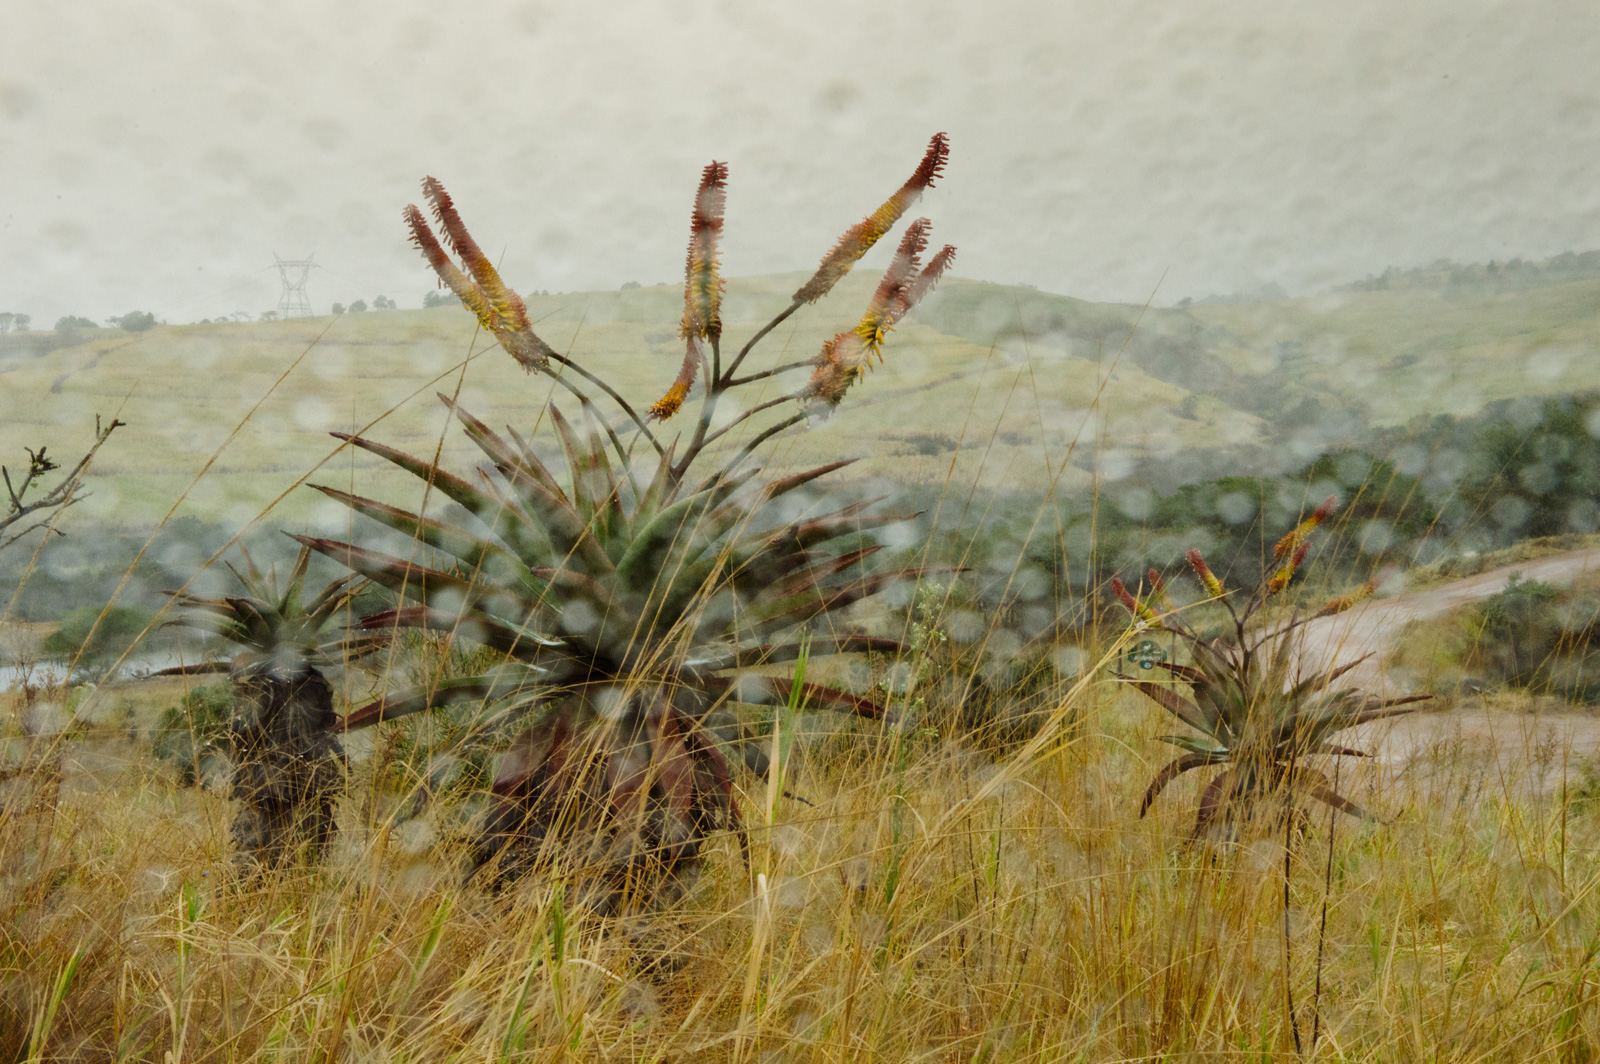 game farm in the rain